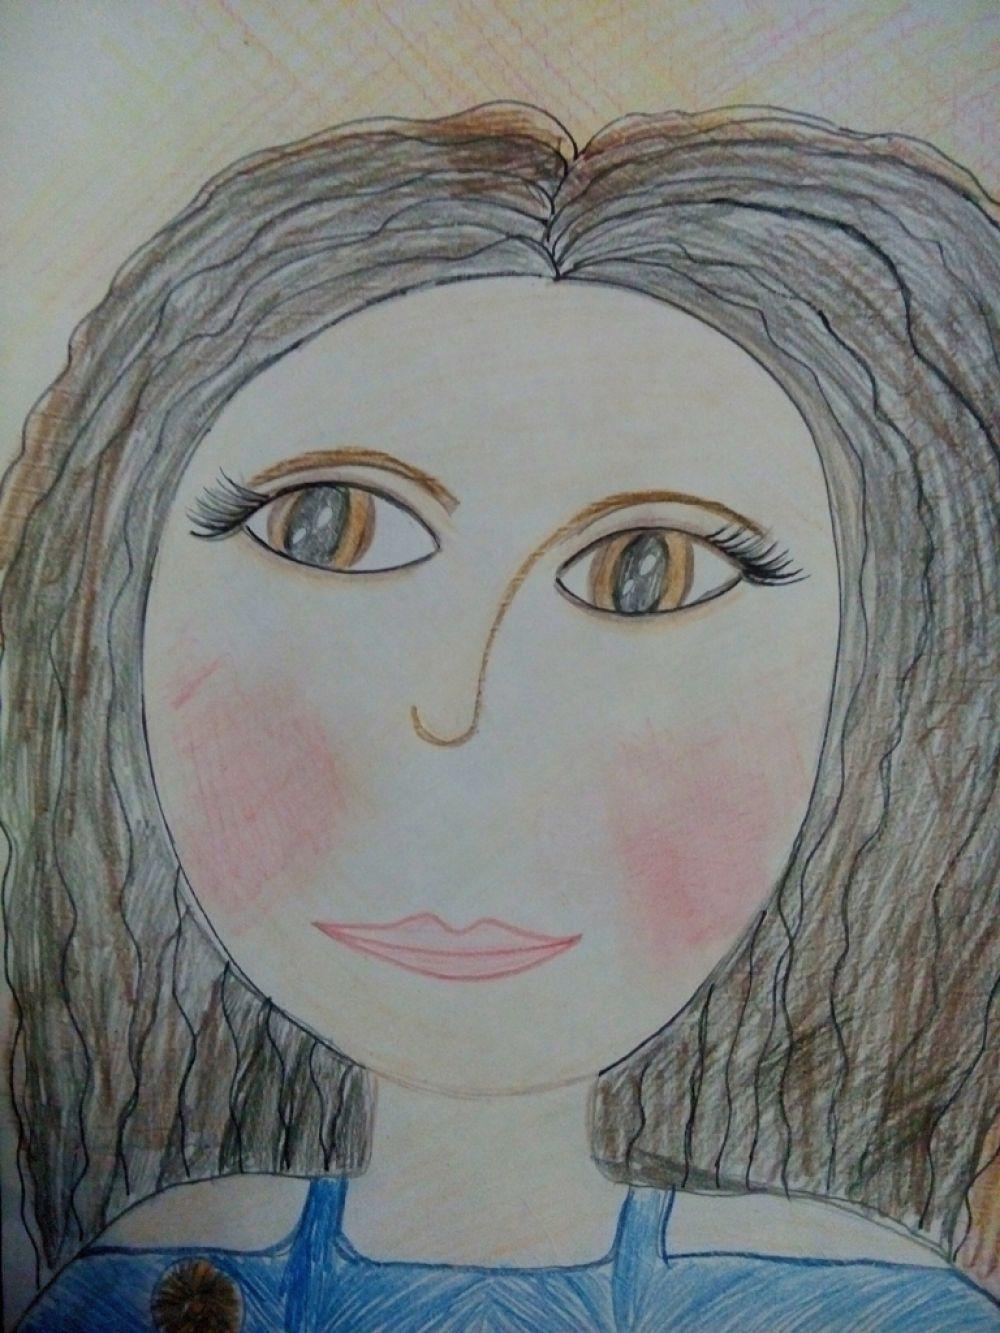 Участник №17. Барлукова Светлана